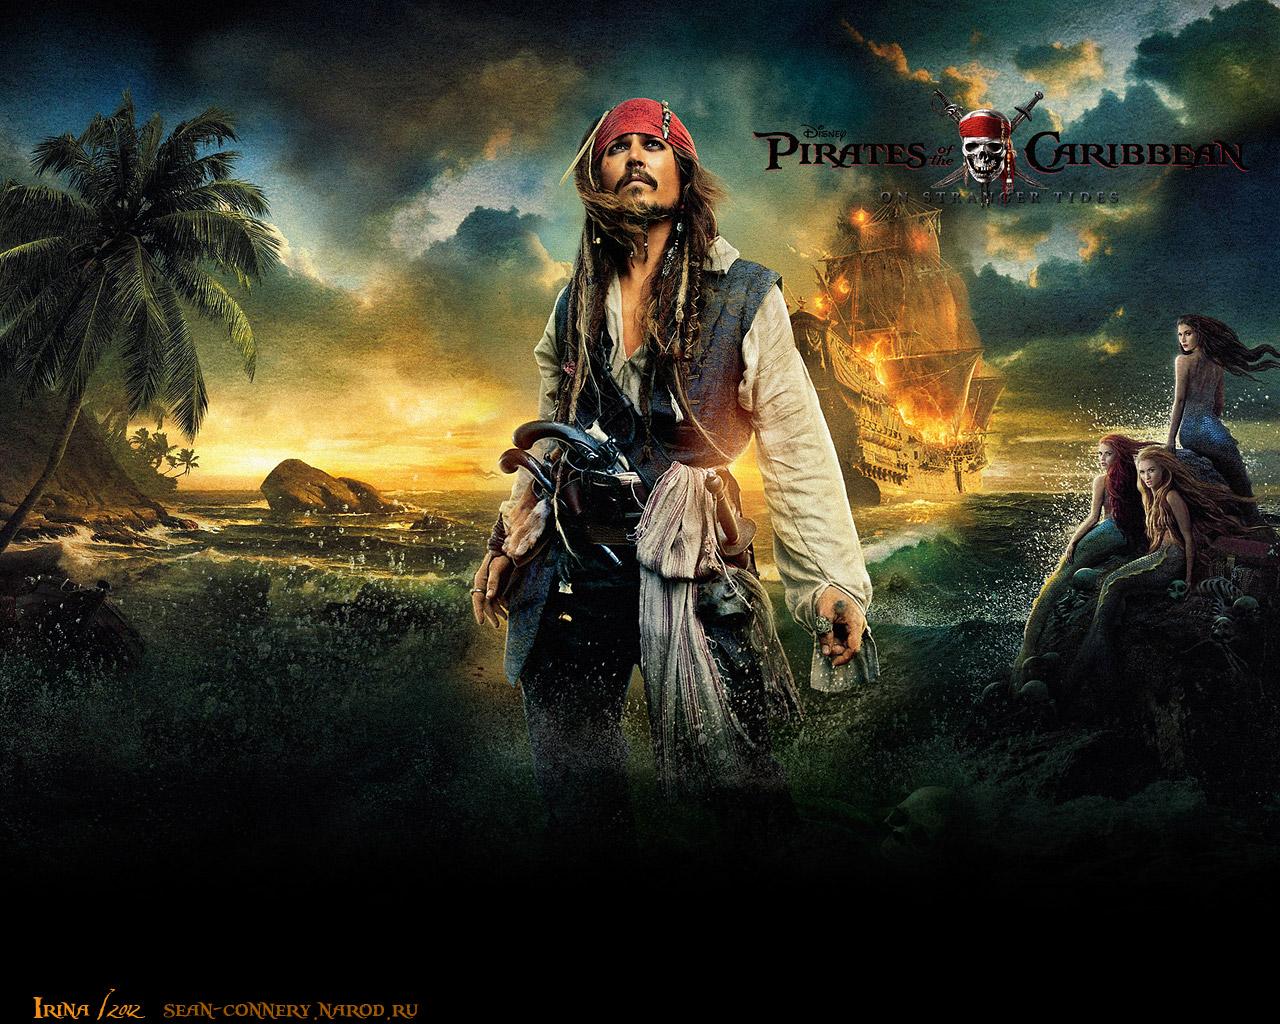 77 Jack Sparrow Wallpaper On Wallpapersafari